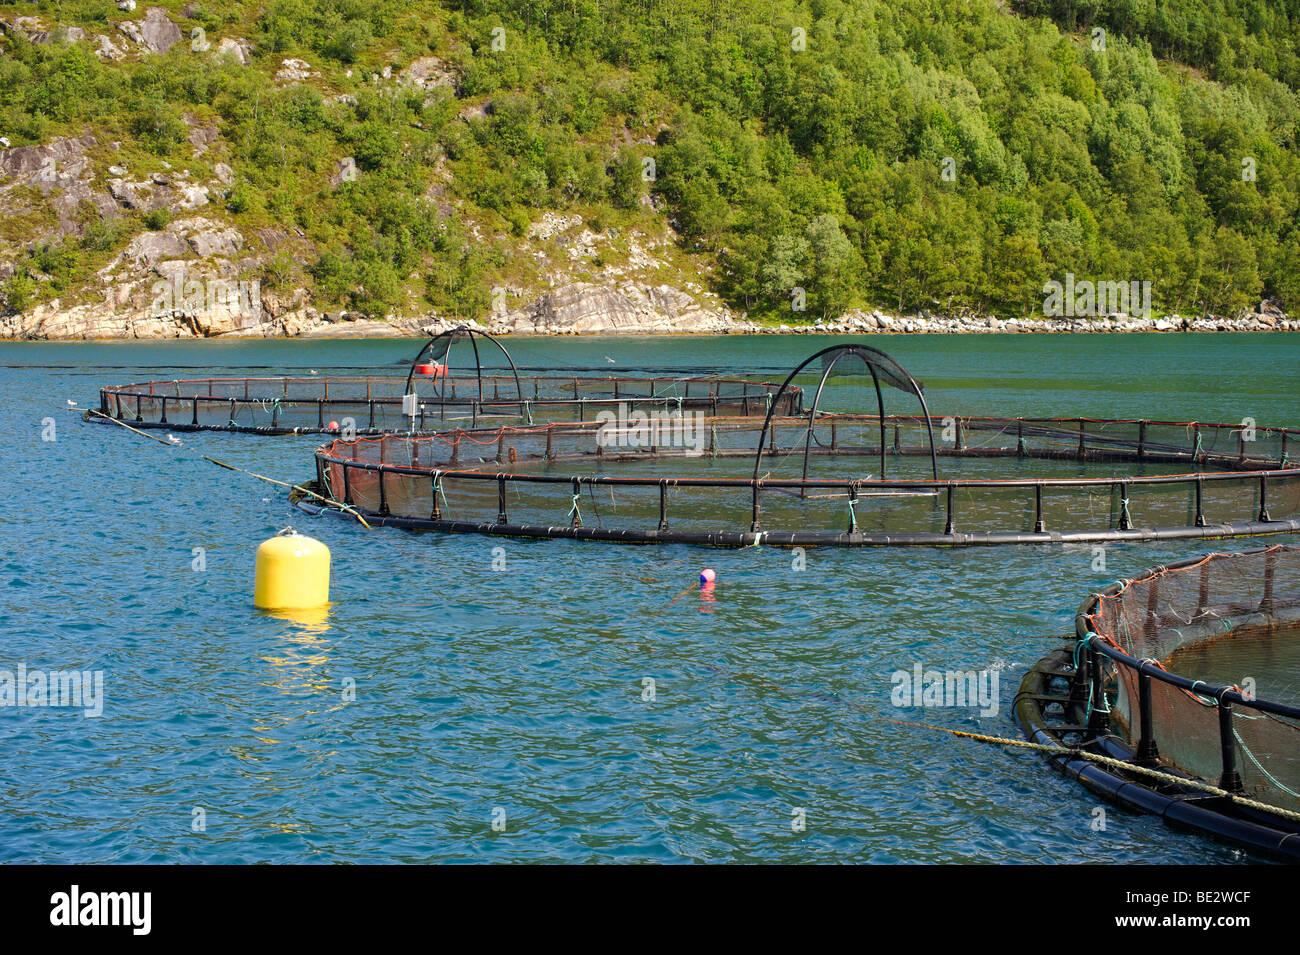 Salmon farm, Holandfjord, Norway, Scandinavia, Europe - Stock Image